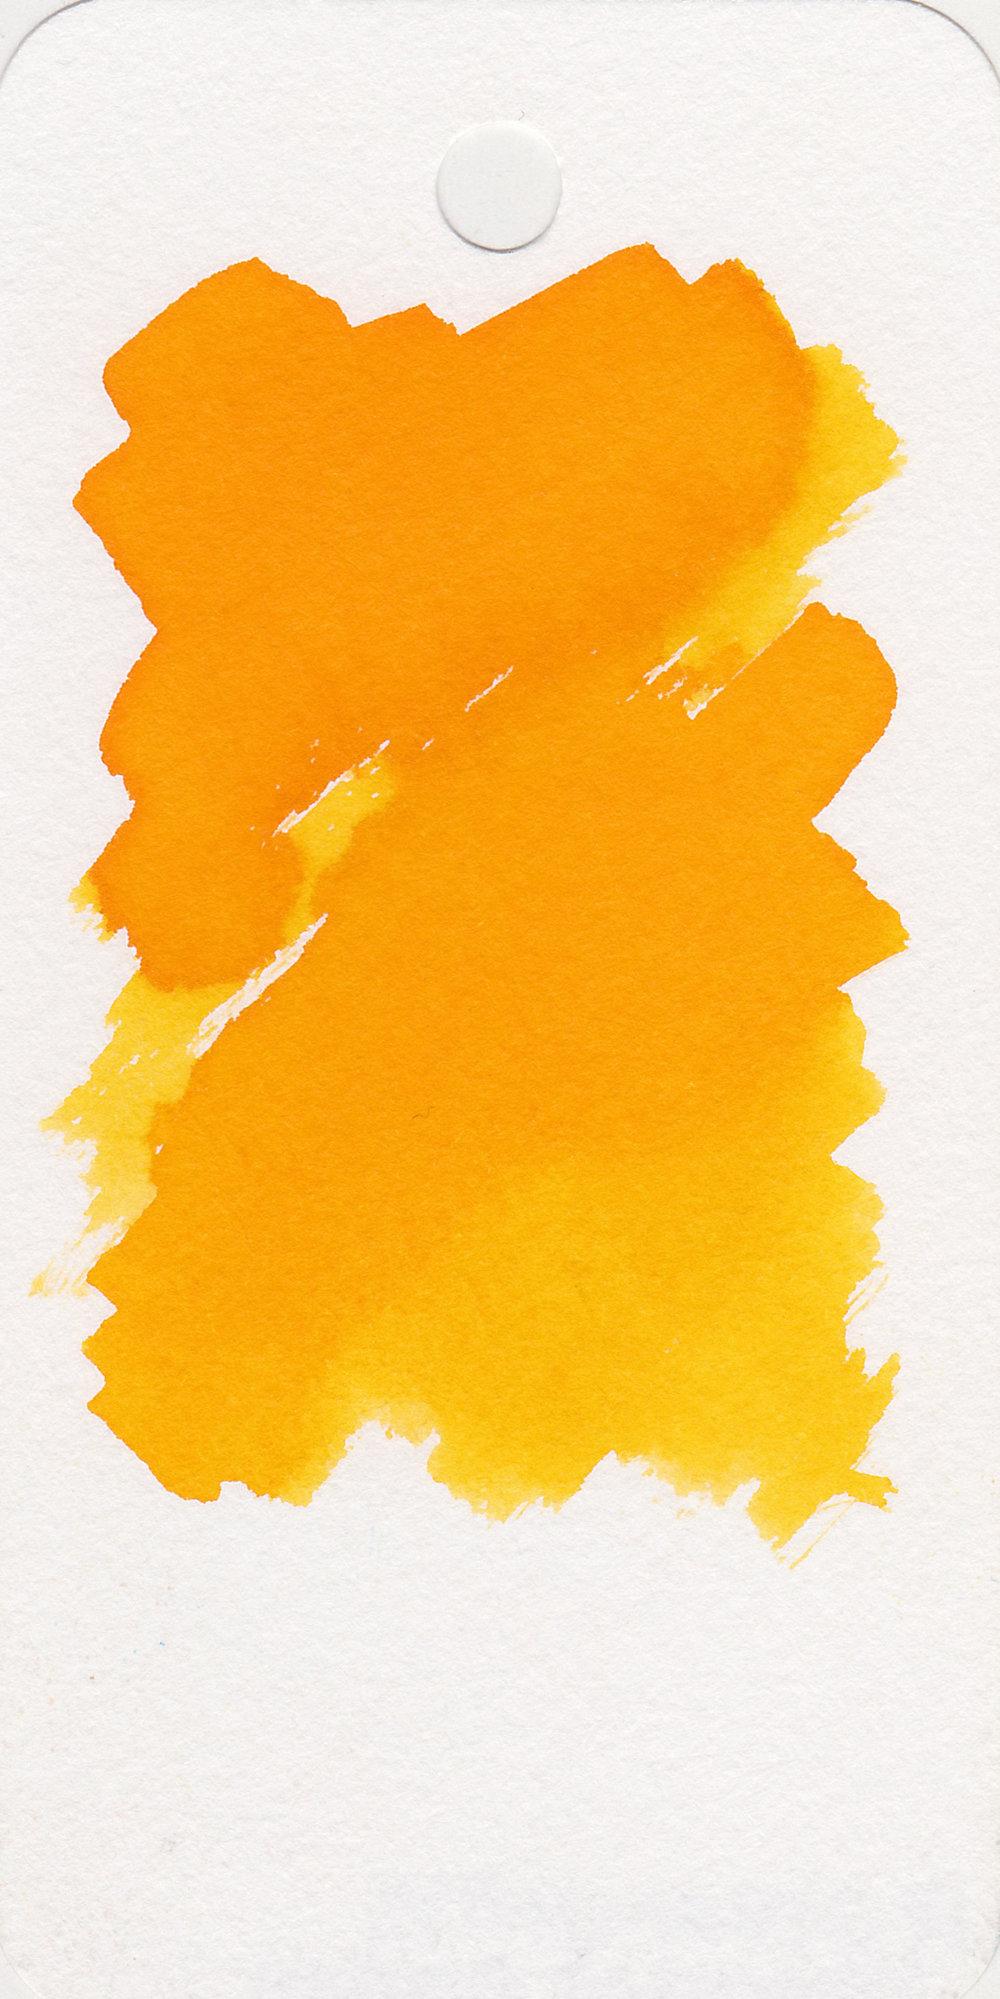 mb-golden-yellow-3.jpg